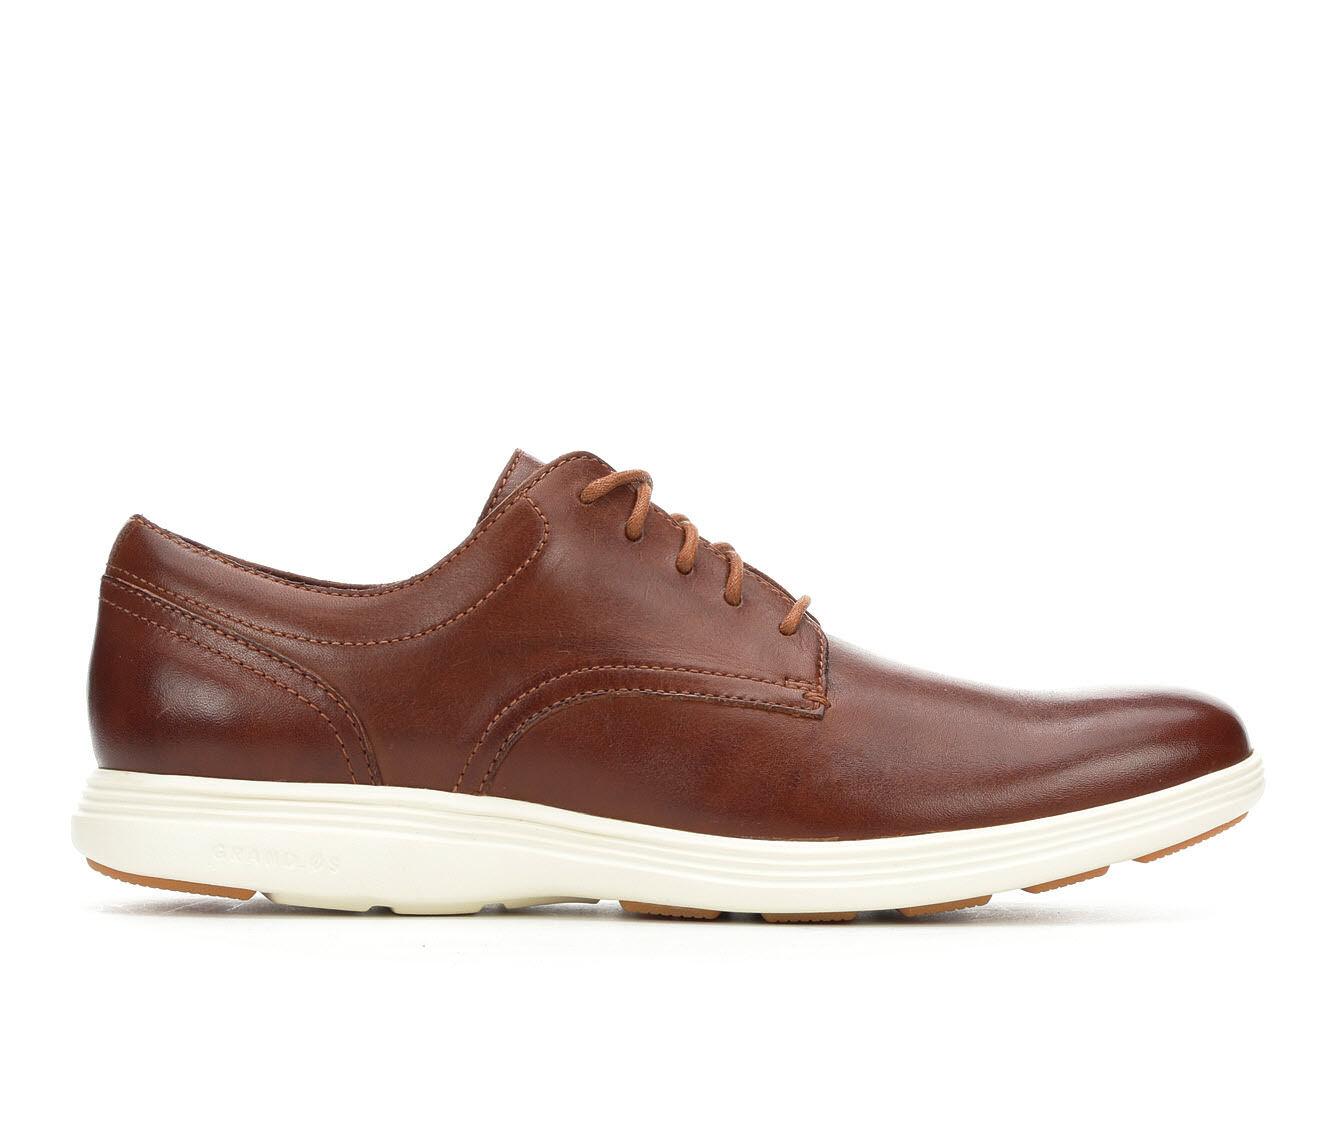 Men's Cole Haan Grand Tour Plain Toe Oxford Dress Shoes Woodbury/Ivory